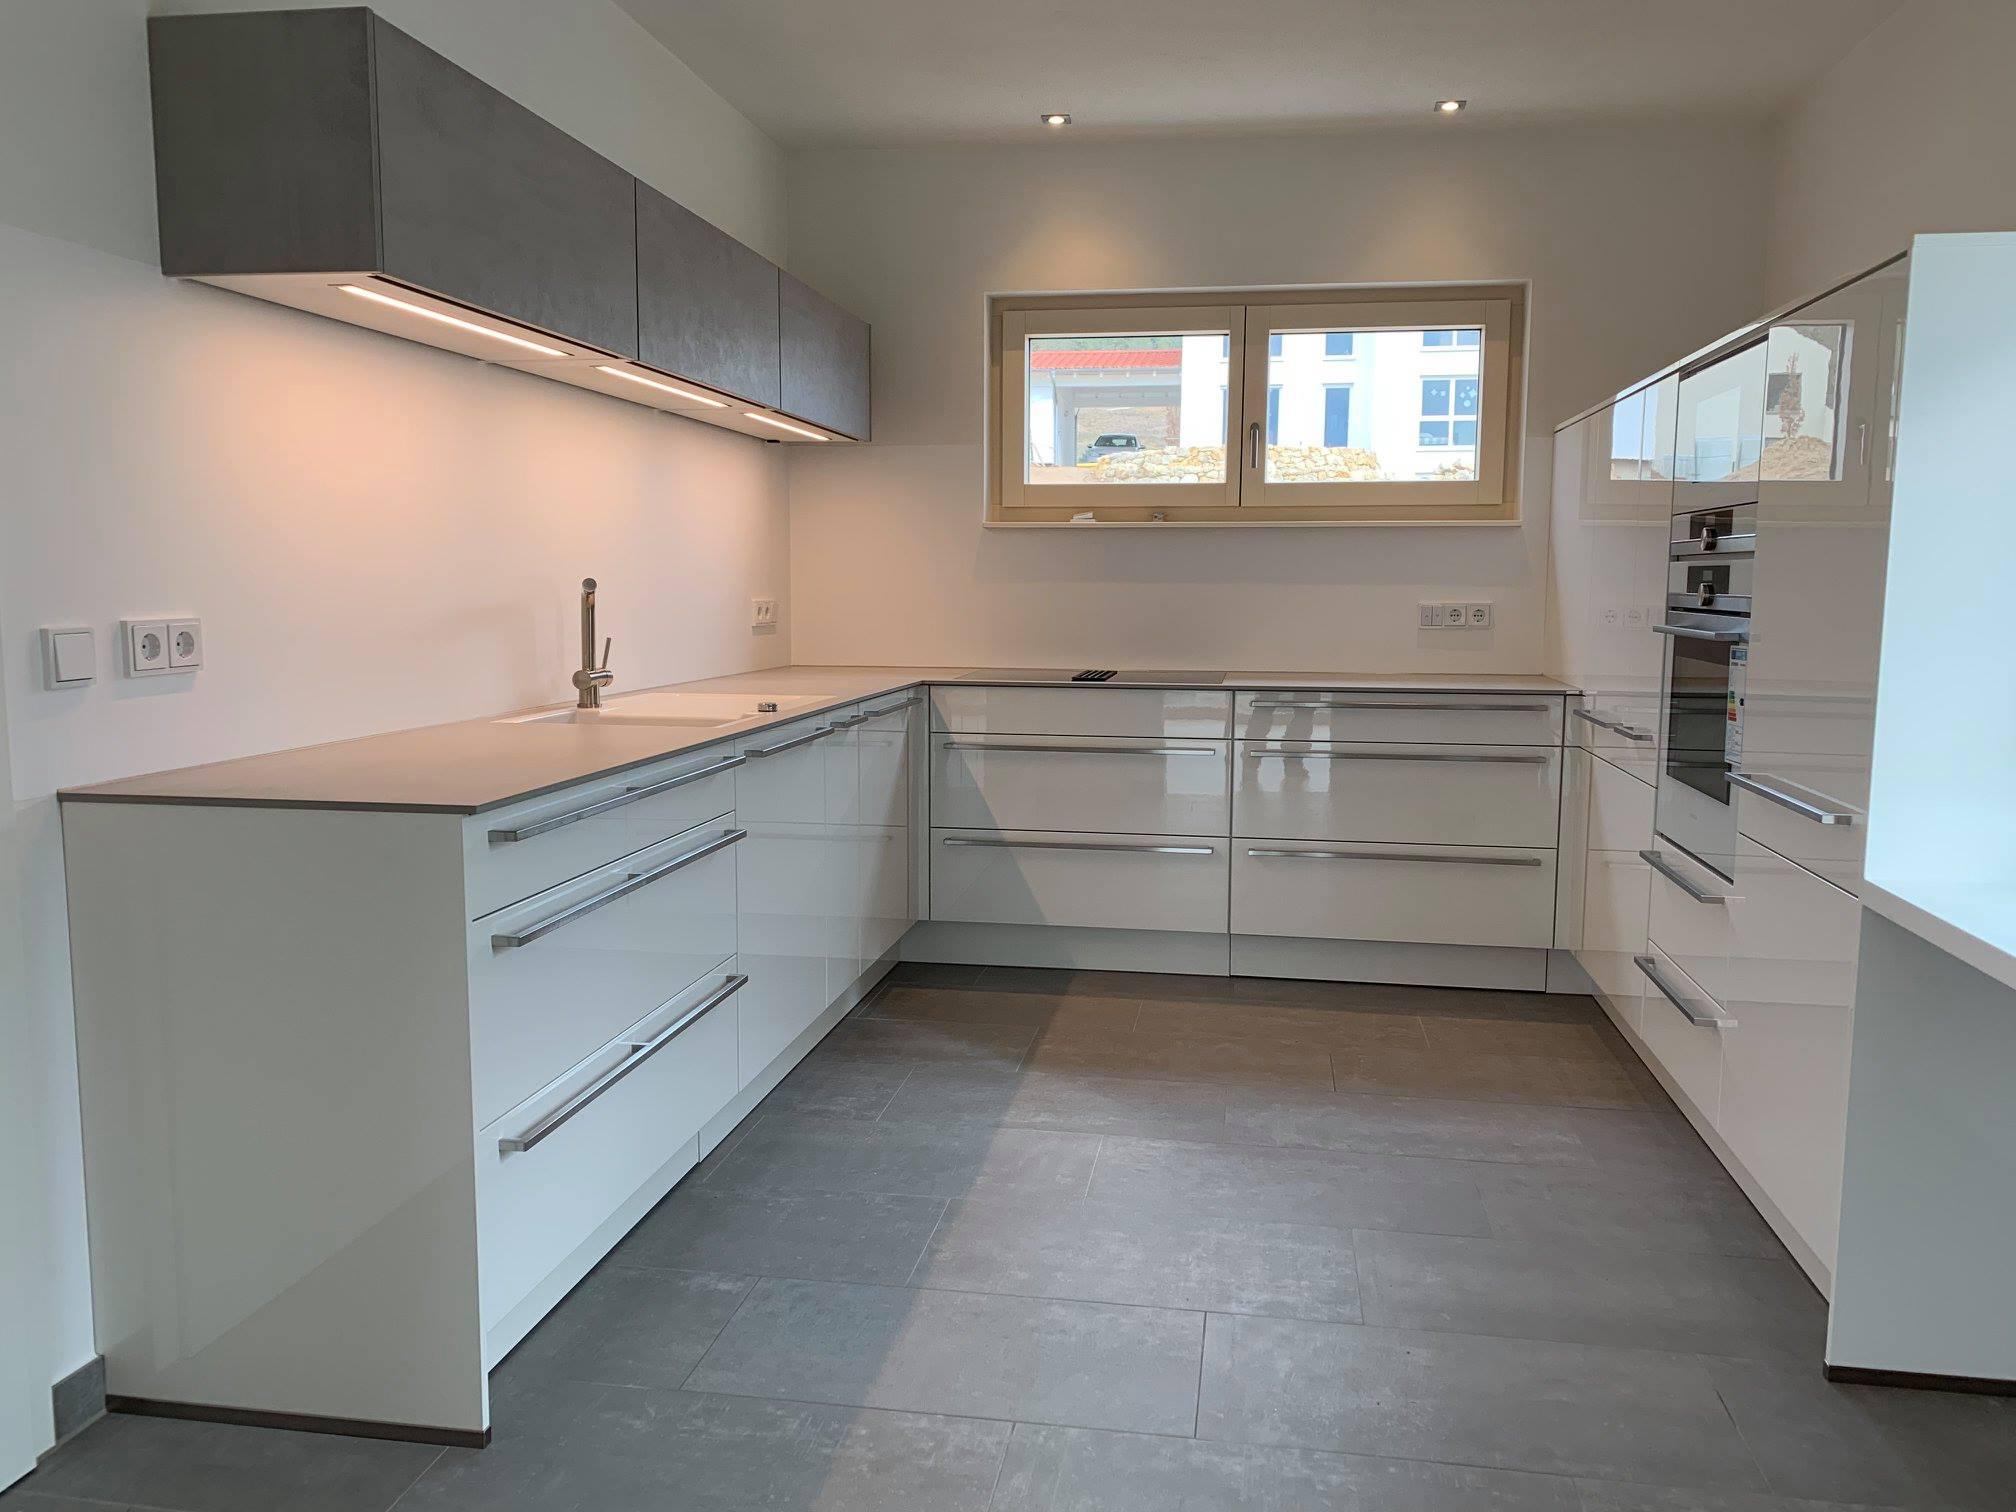 Kuche Weiss Beige   Best Home Ideas 2020   ferdinandsanders